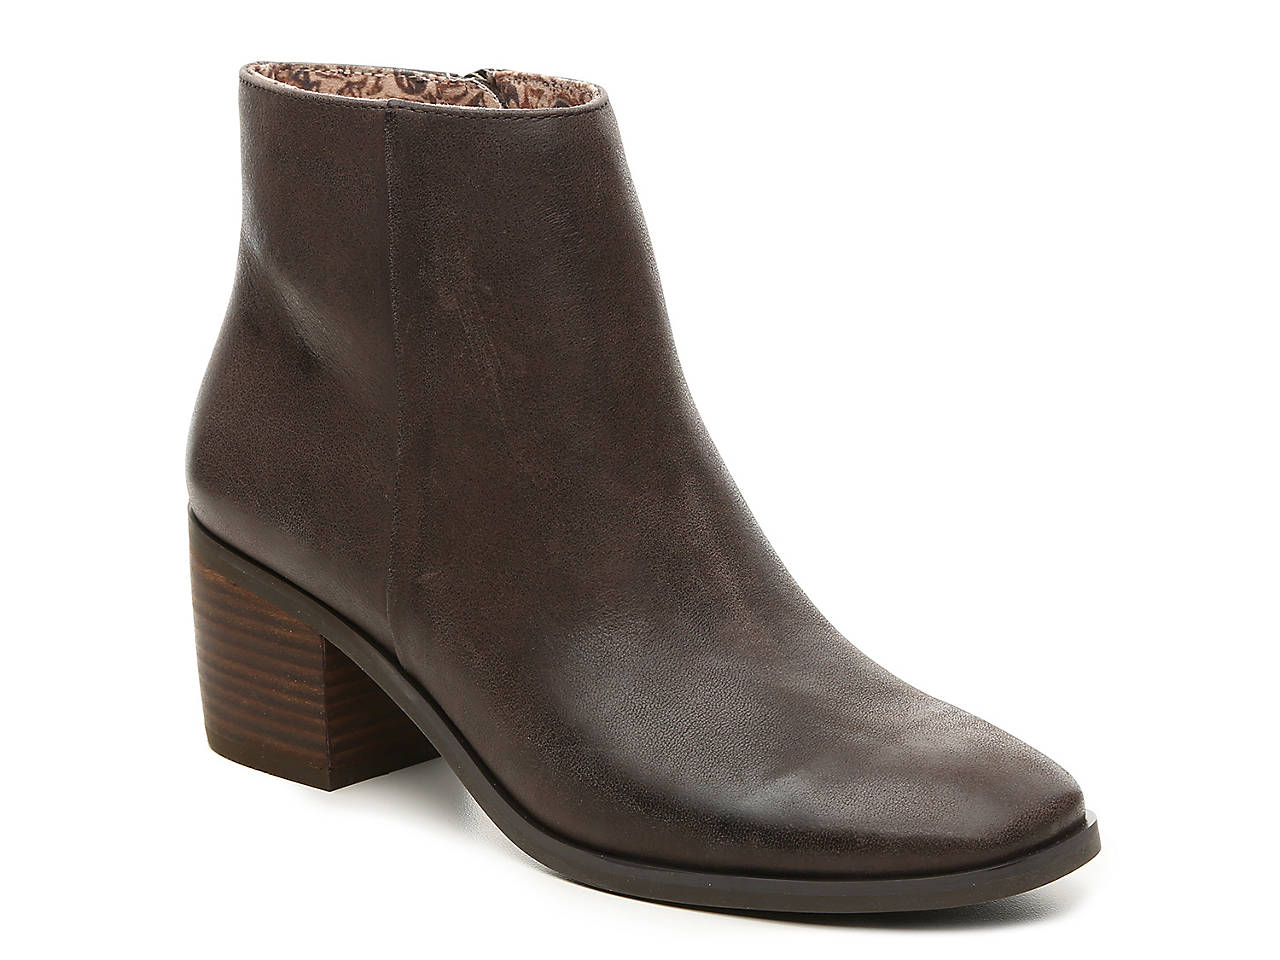 916757d18e4 Lucky Brand Malvelia Bootie Women s Shoes